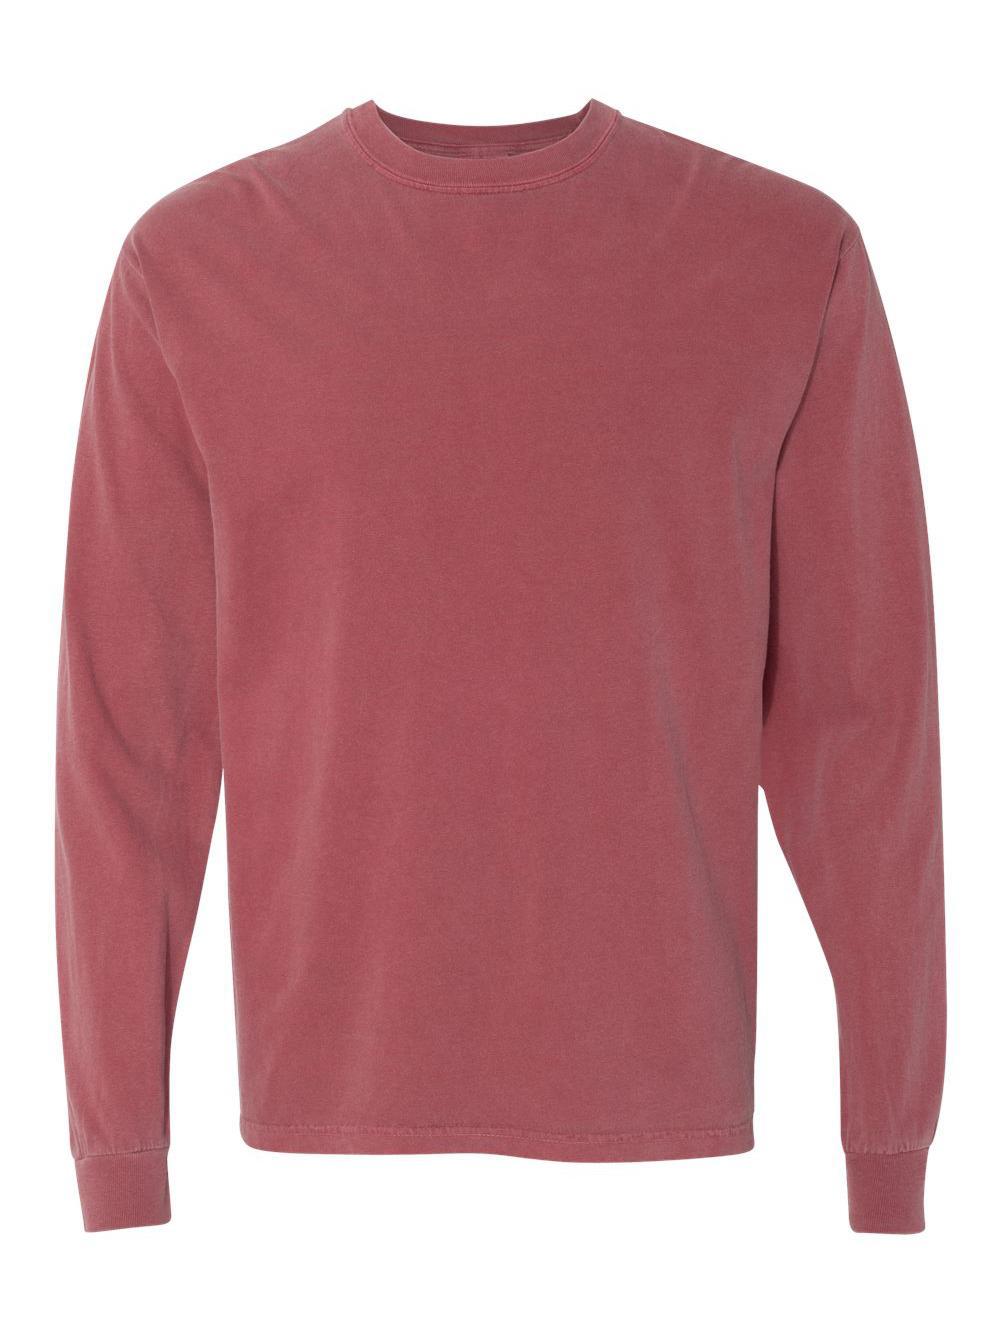 Comfort-Colors-Garment-Dyed-Heavyweight-Ringspun-Long-Sleeve-T-Shirt-6014 thumbnail 15